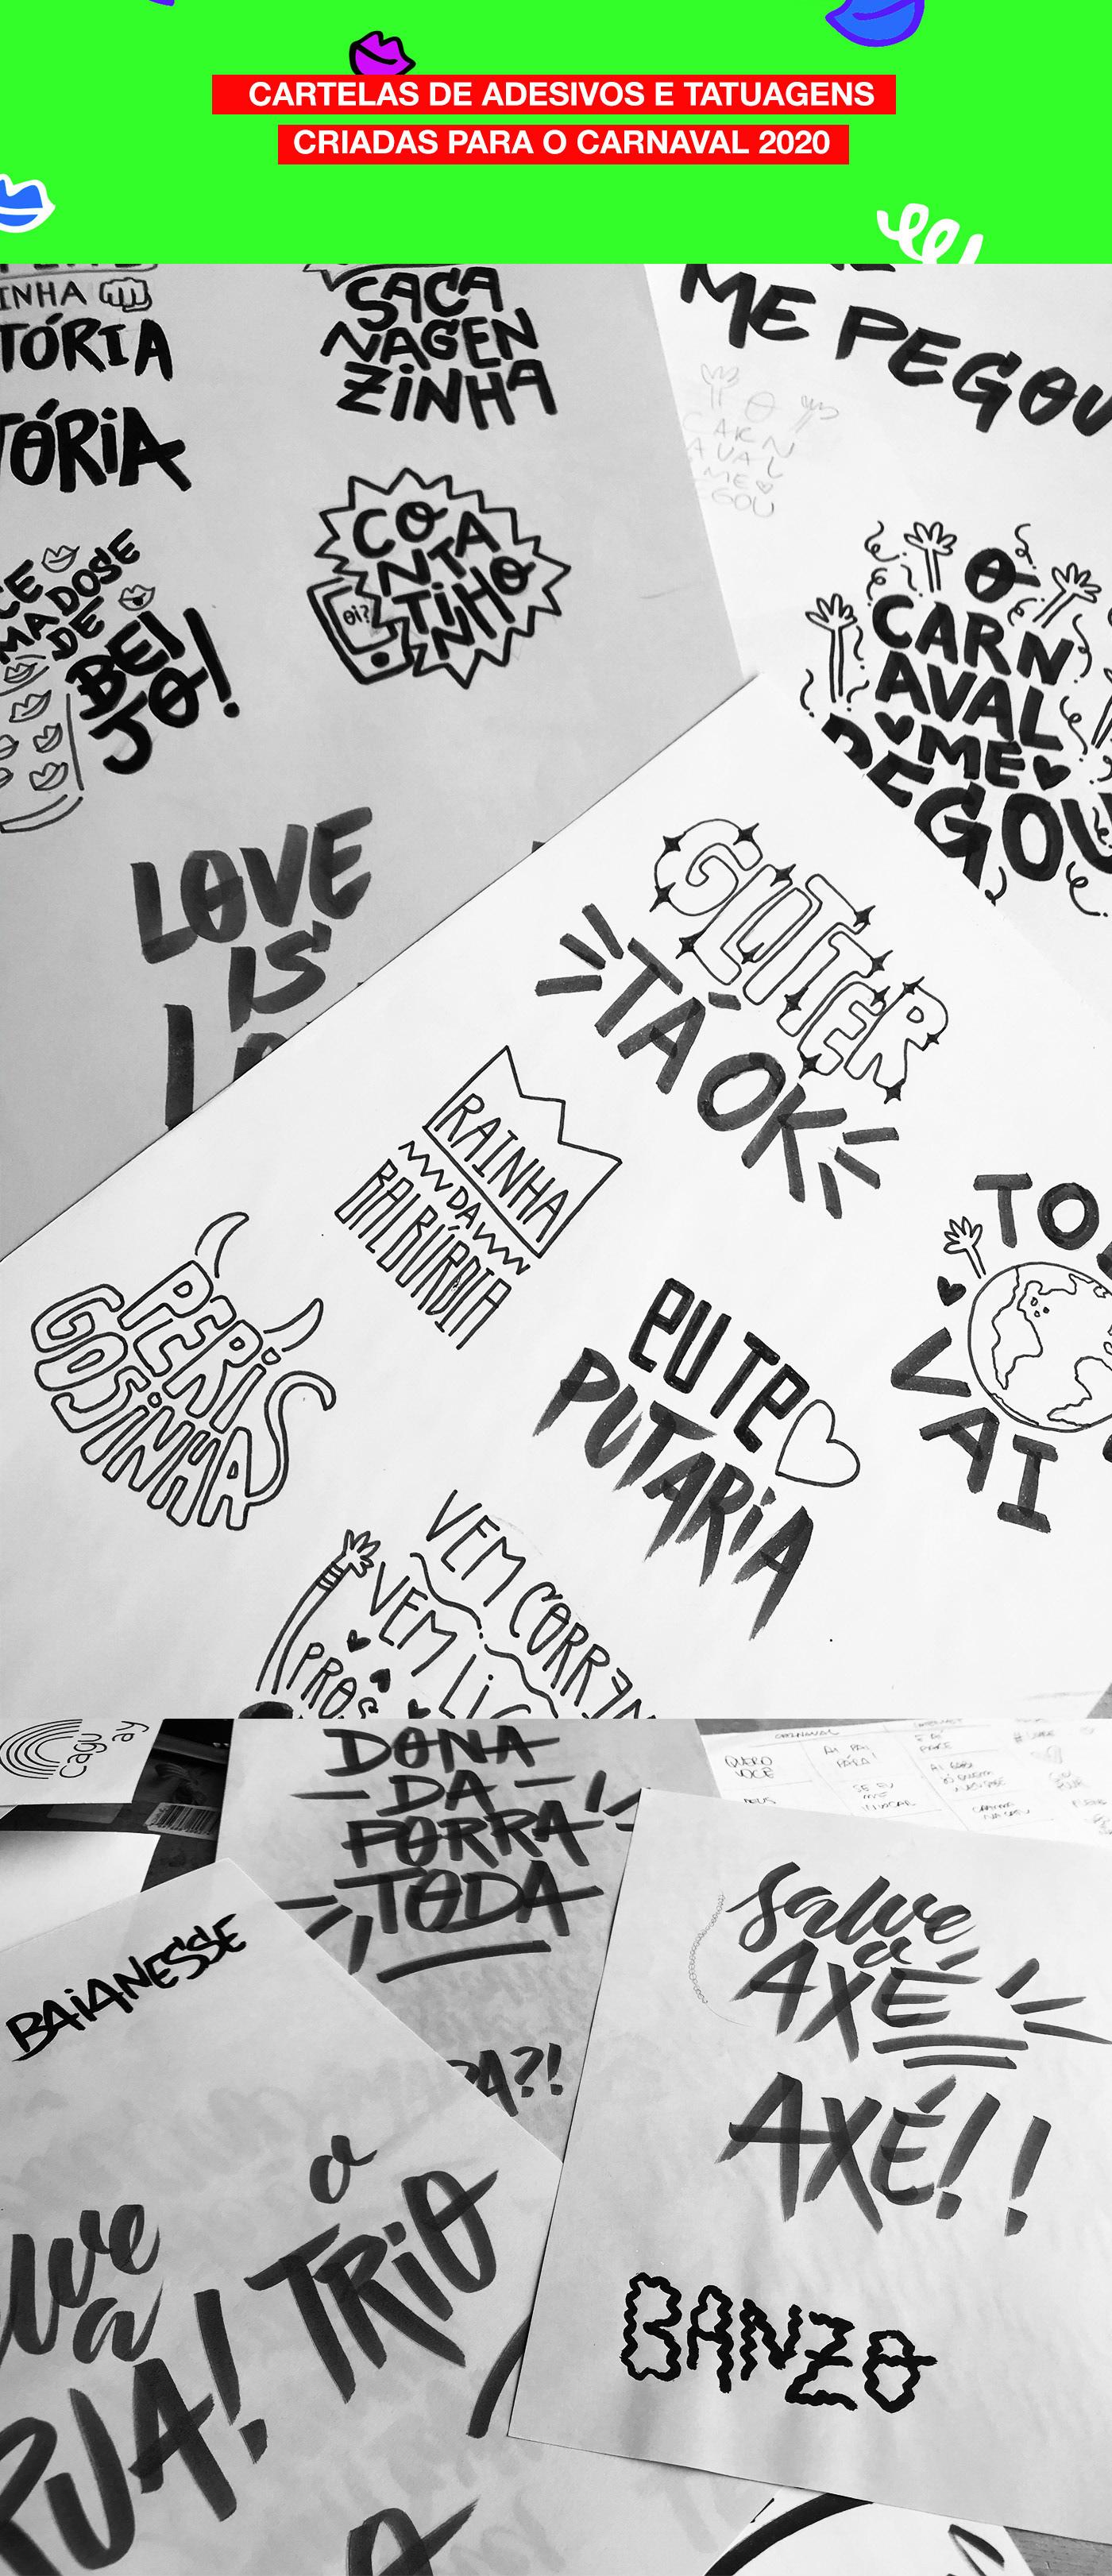 axe,bahia,Calligraphy  ,Carnaval,carnavalsalvador,lettering,music,salvador,stickers,Tatuagem